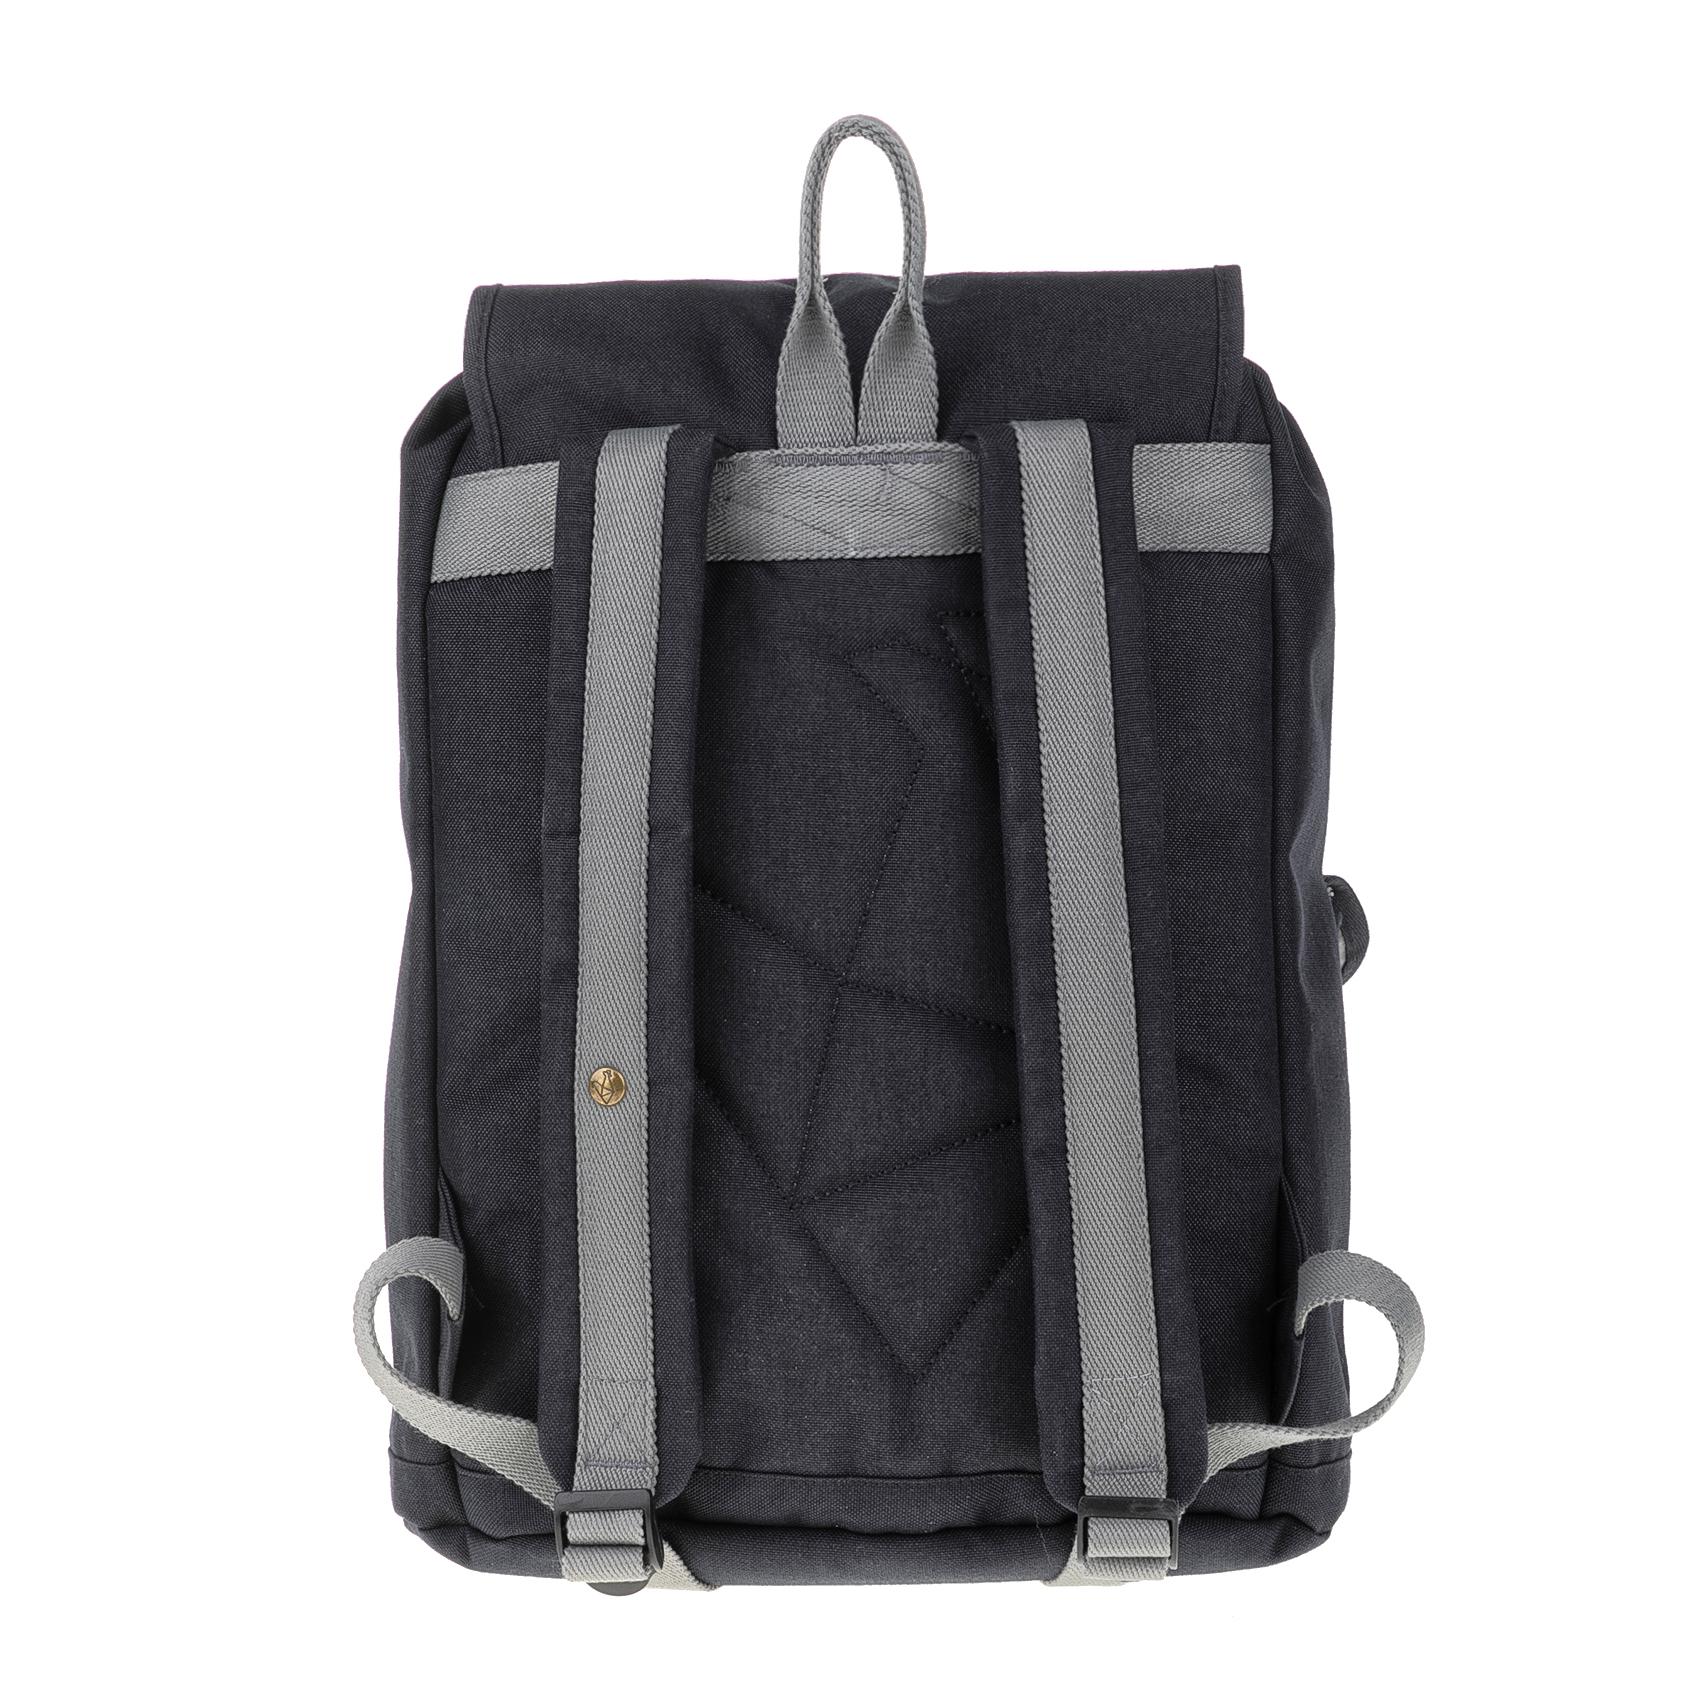 G.RIDE - Τσάντα πλάτης CHLOE μαύρη 433a8d4b6d8